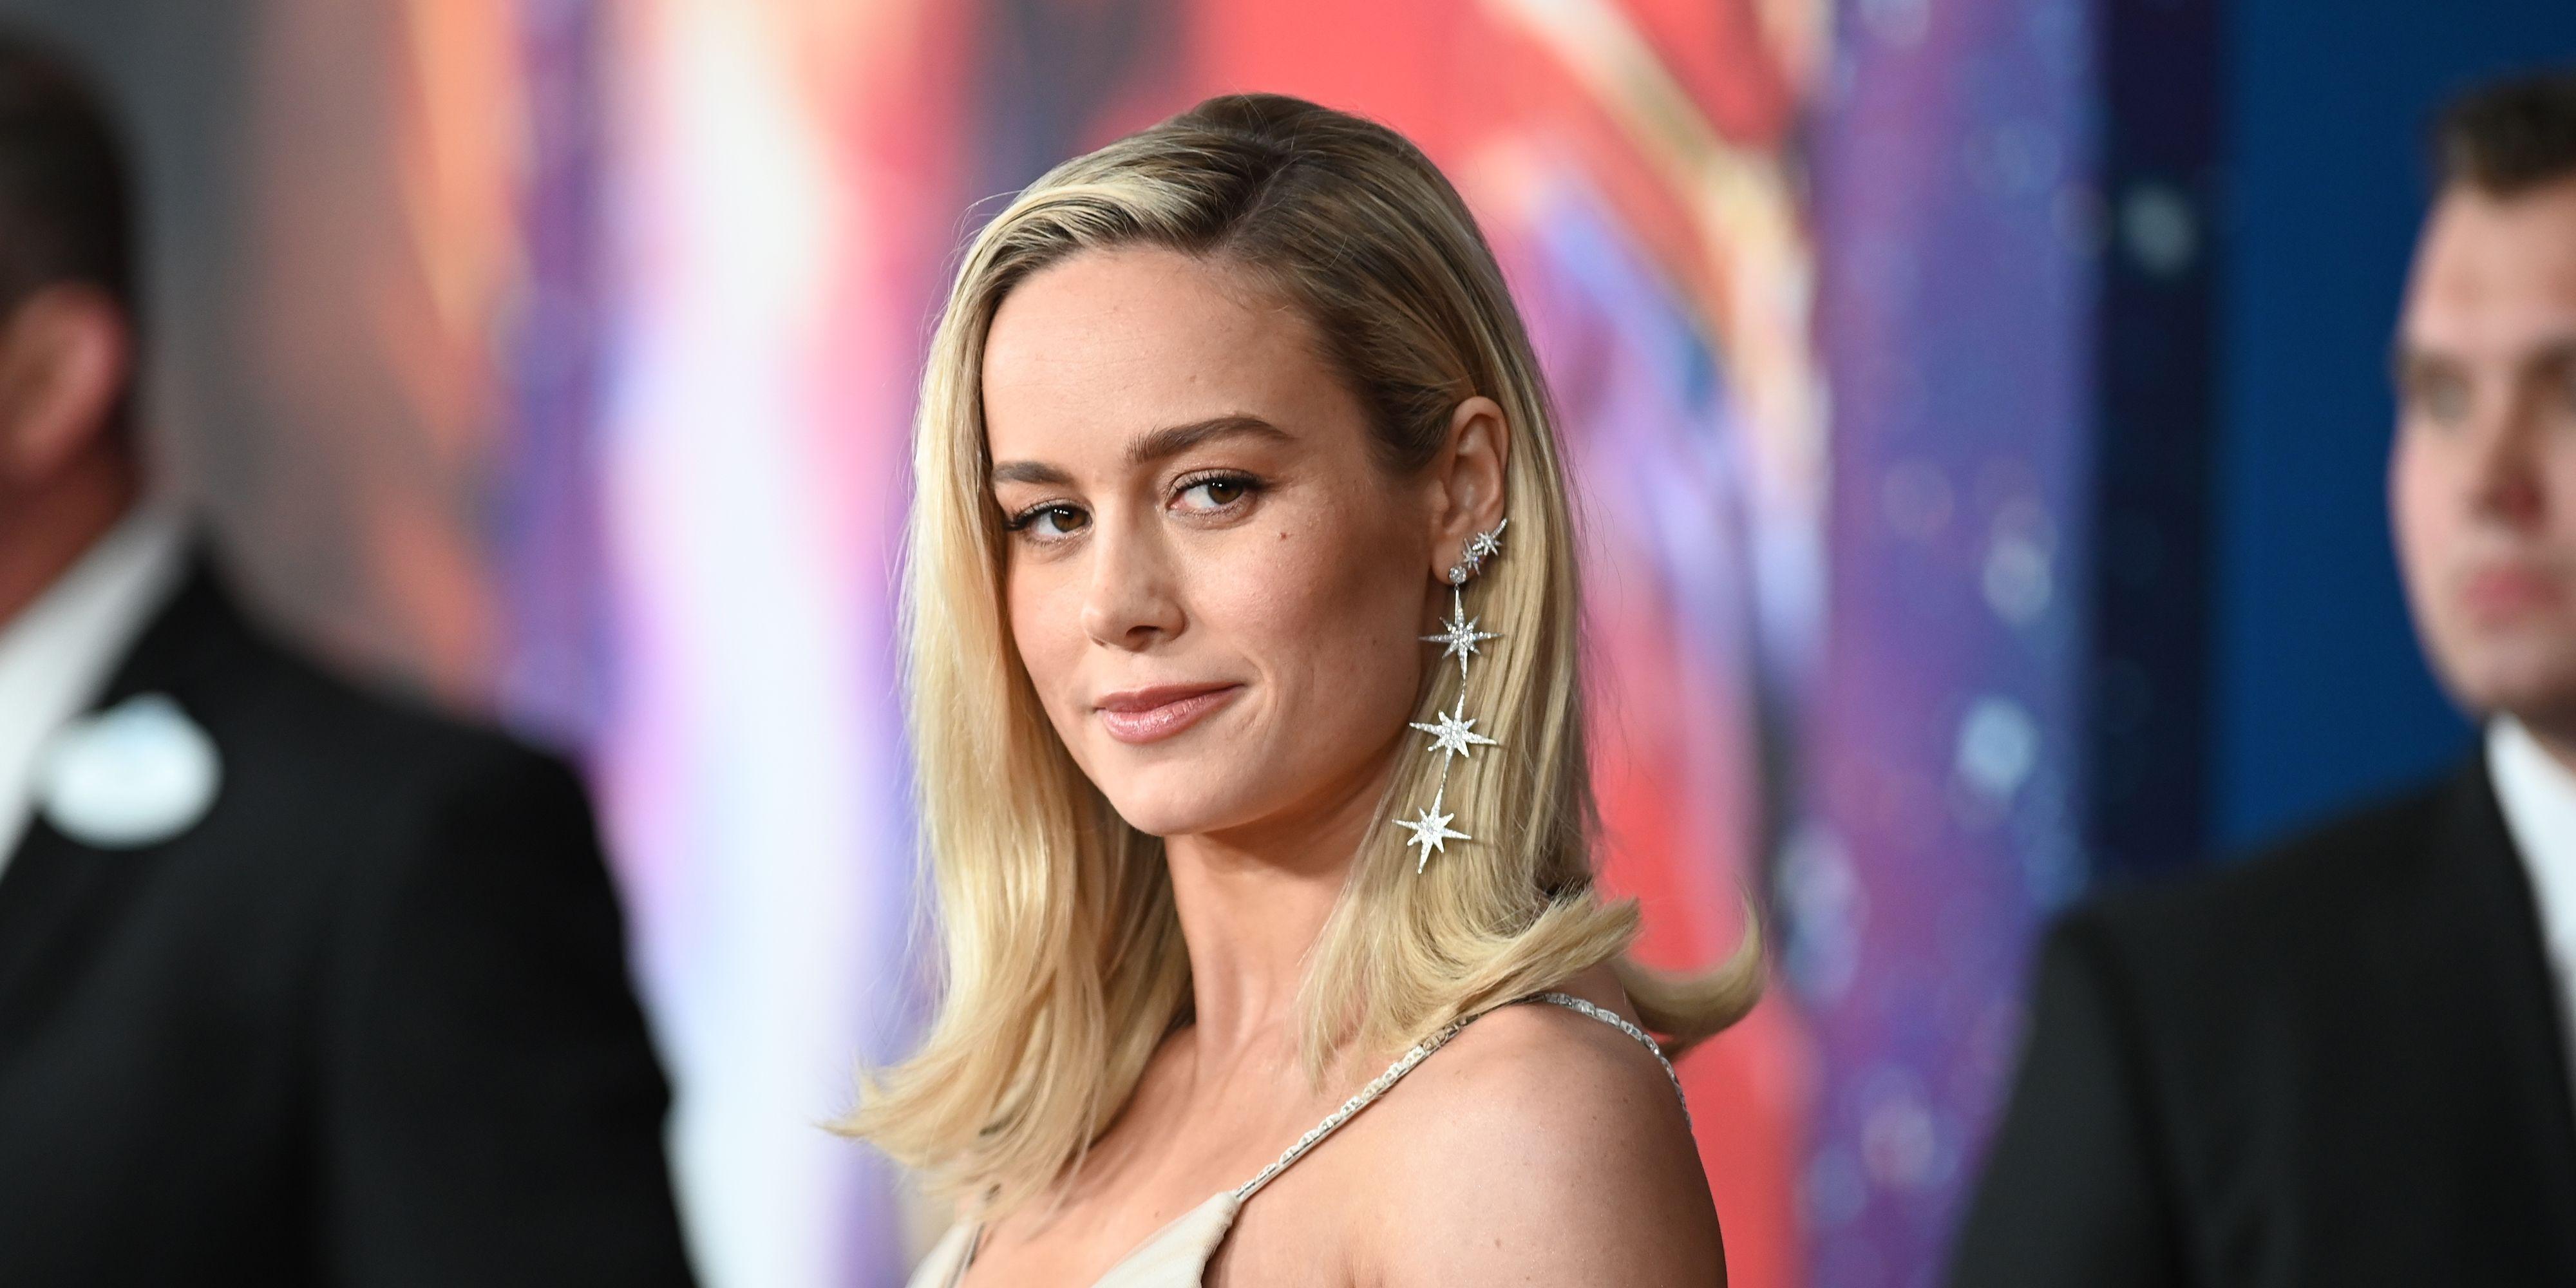 Brie Larson at the Captain Marvel premiere